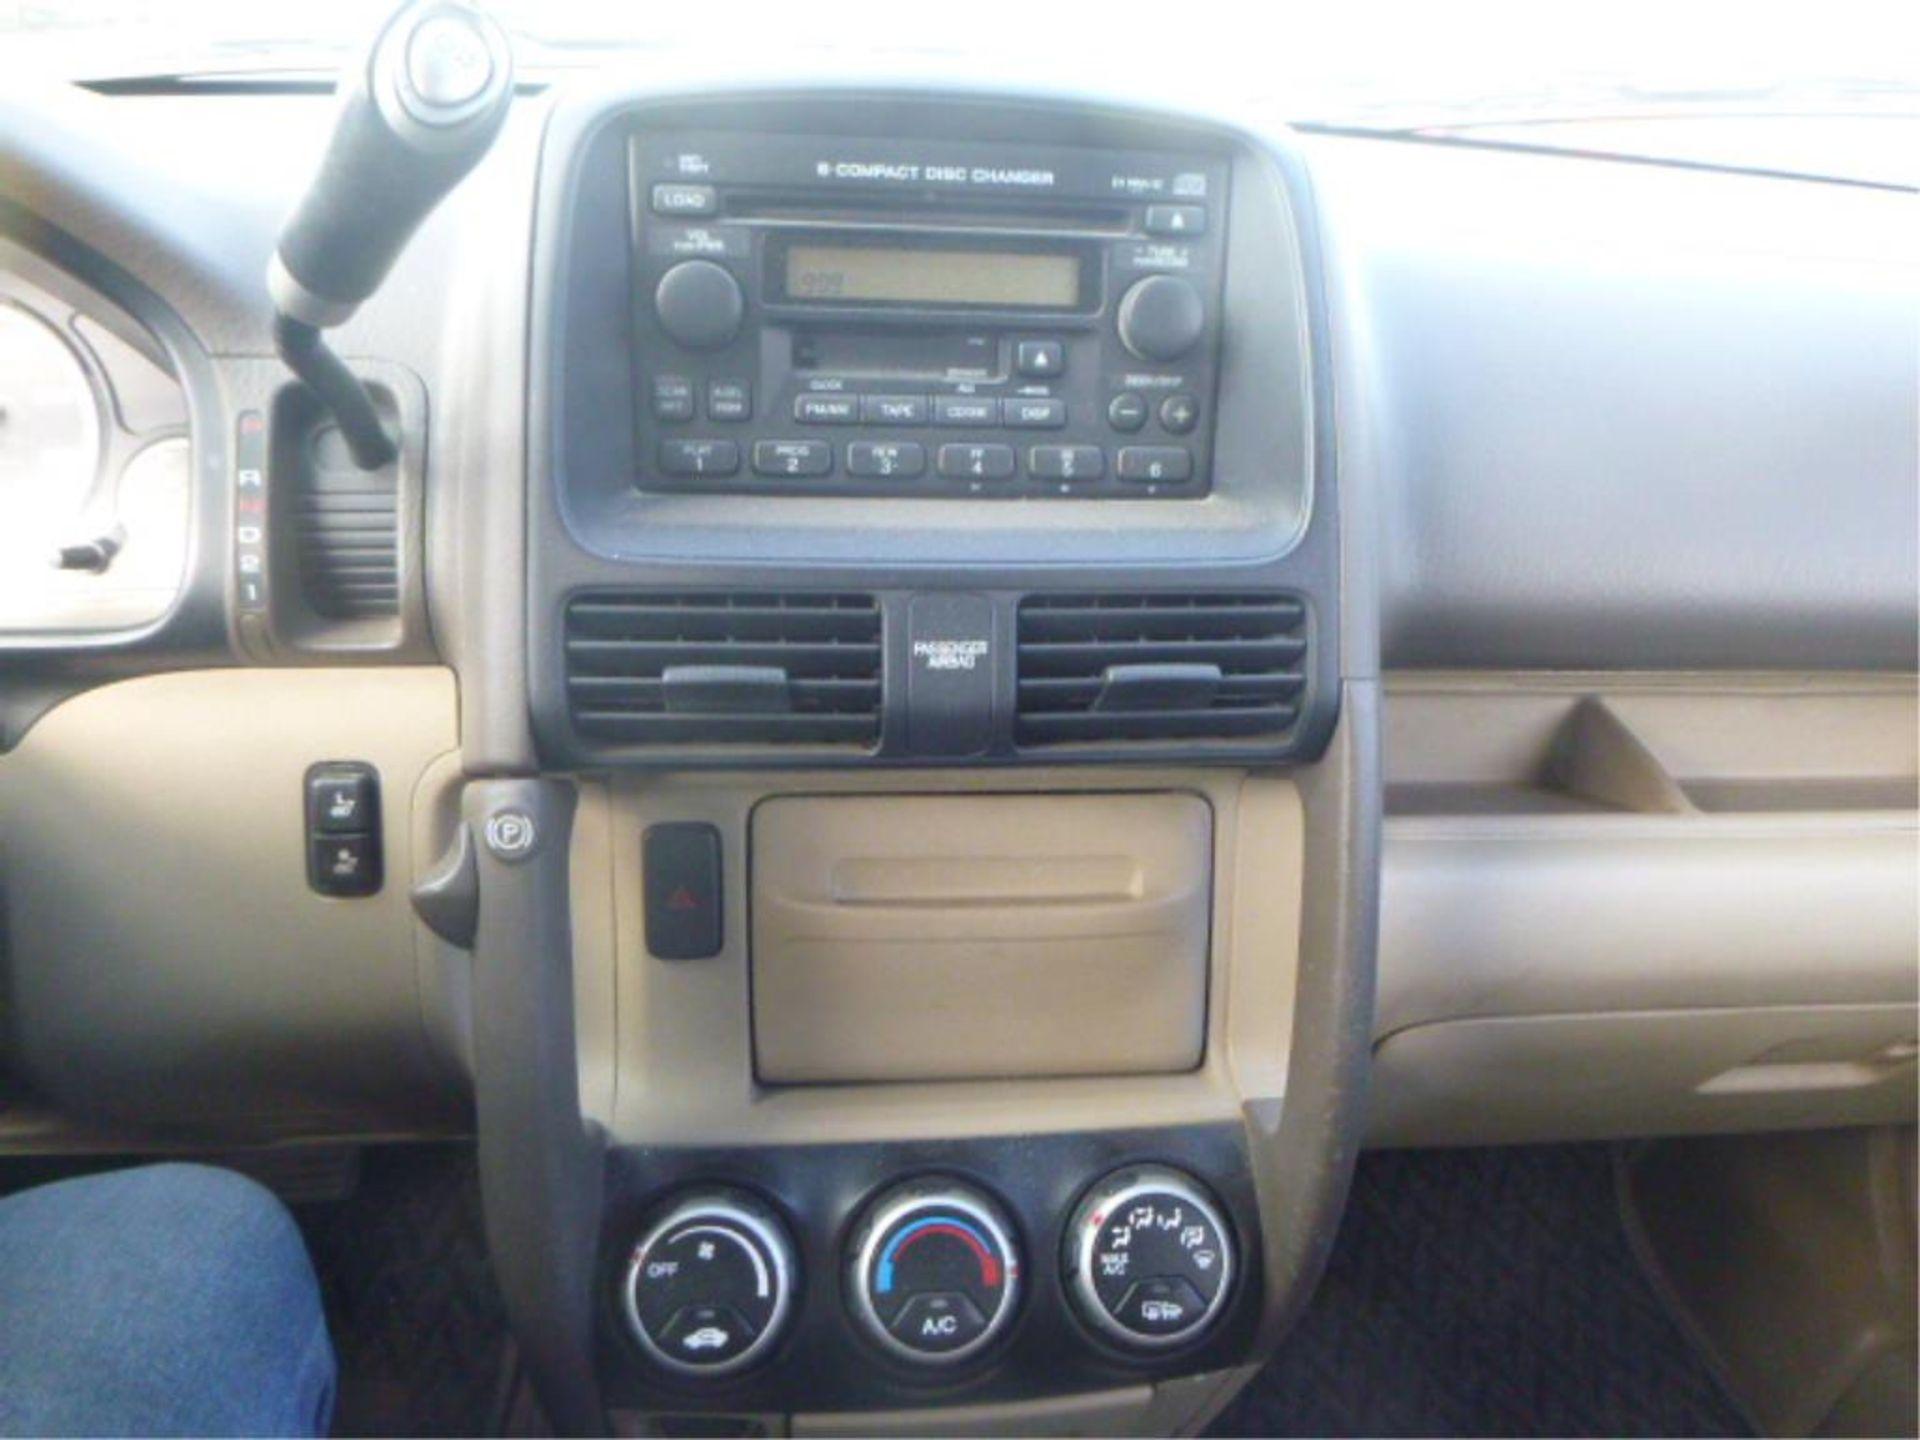 2005 Honda CR-V - Image 14 of 14